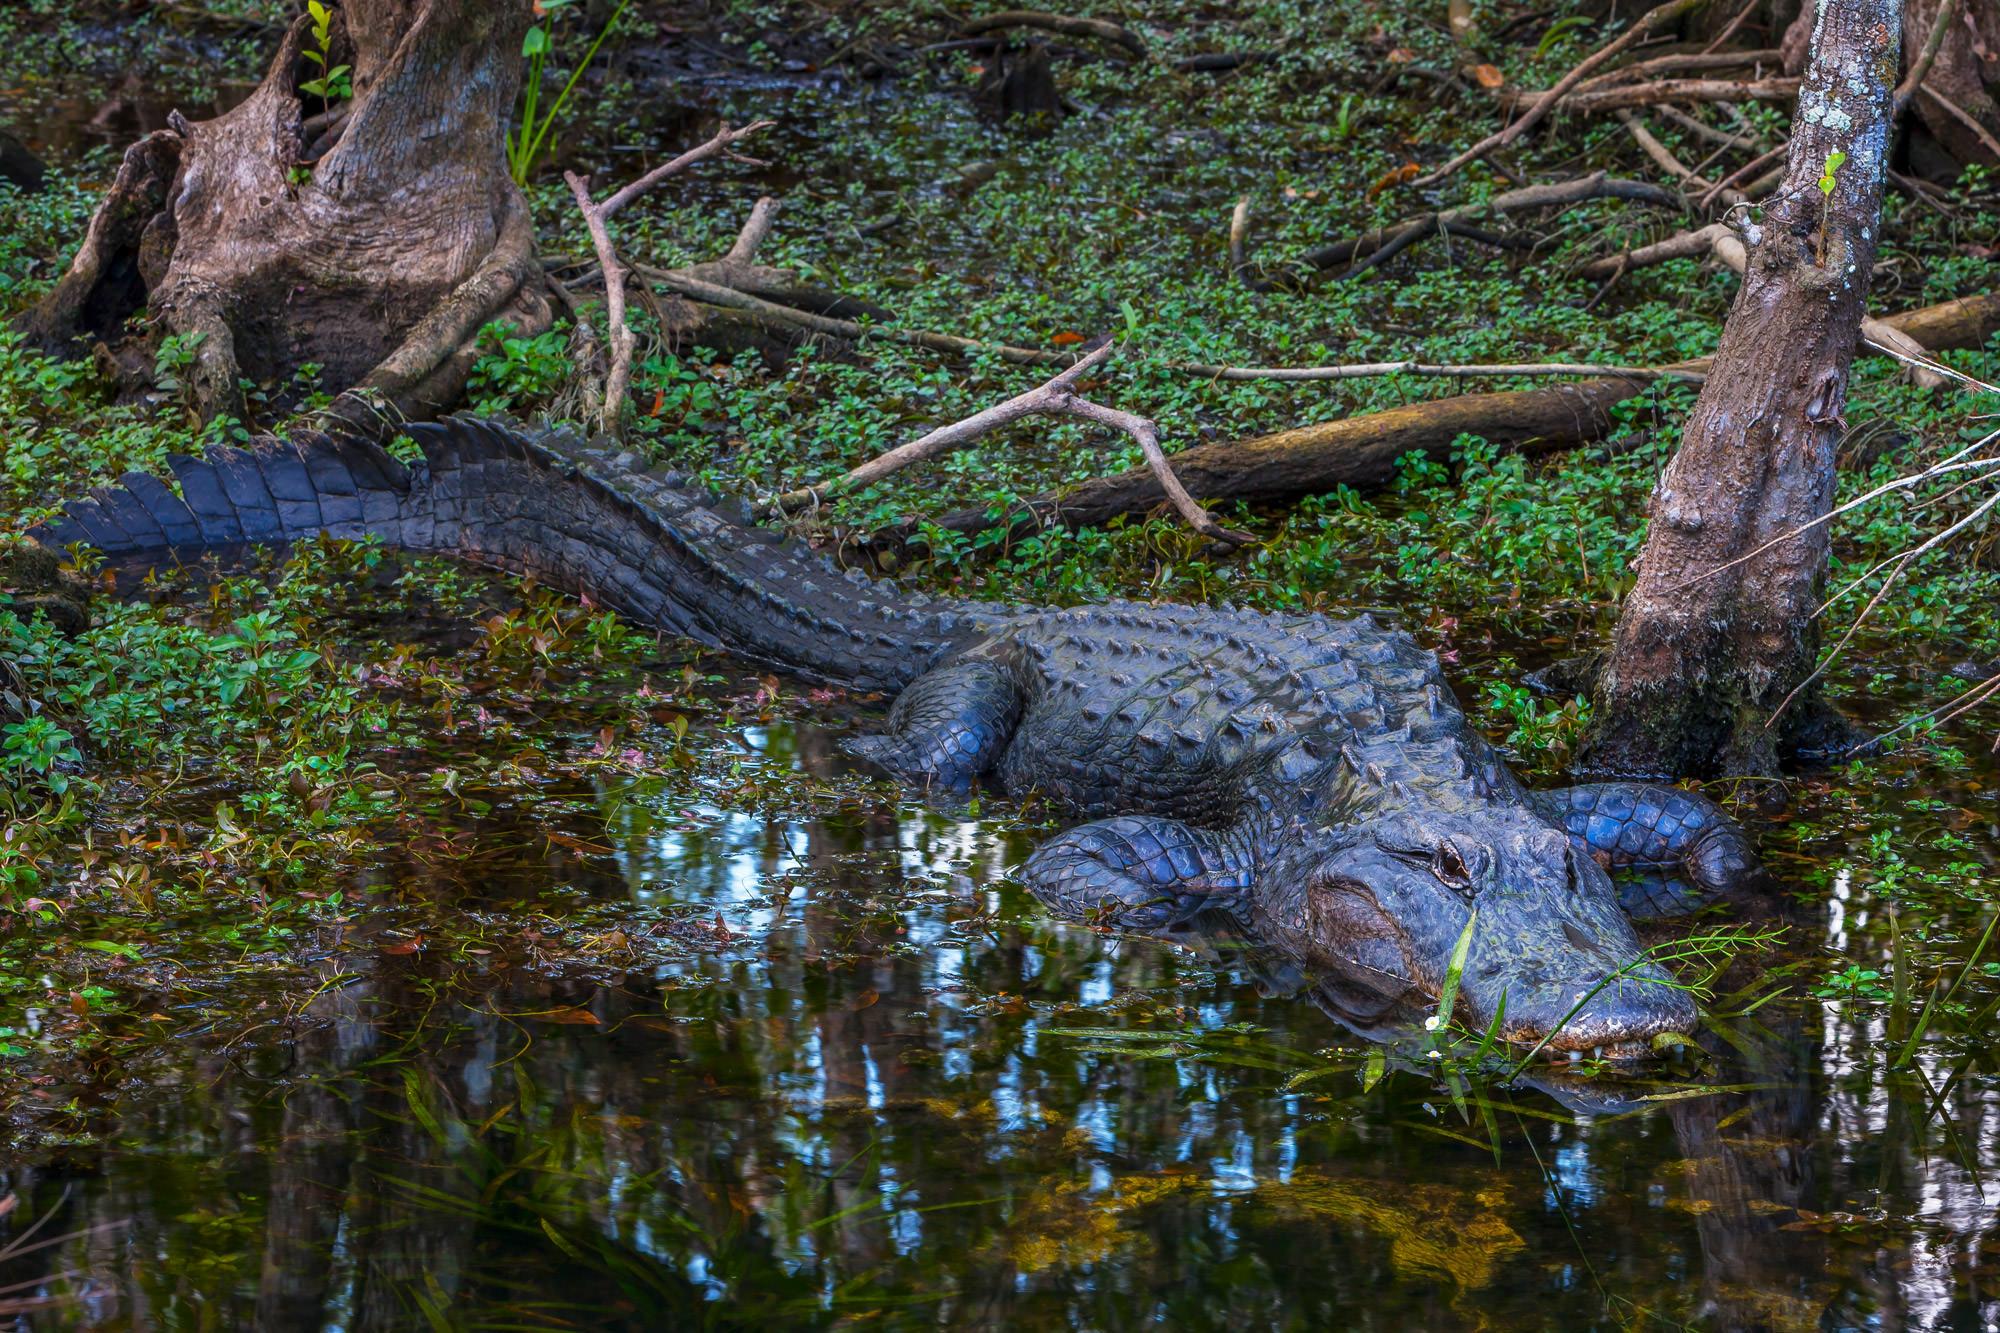 Alligator, Florida, Everglades, limited edition, photograph, fine art, wildlife, photo